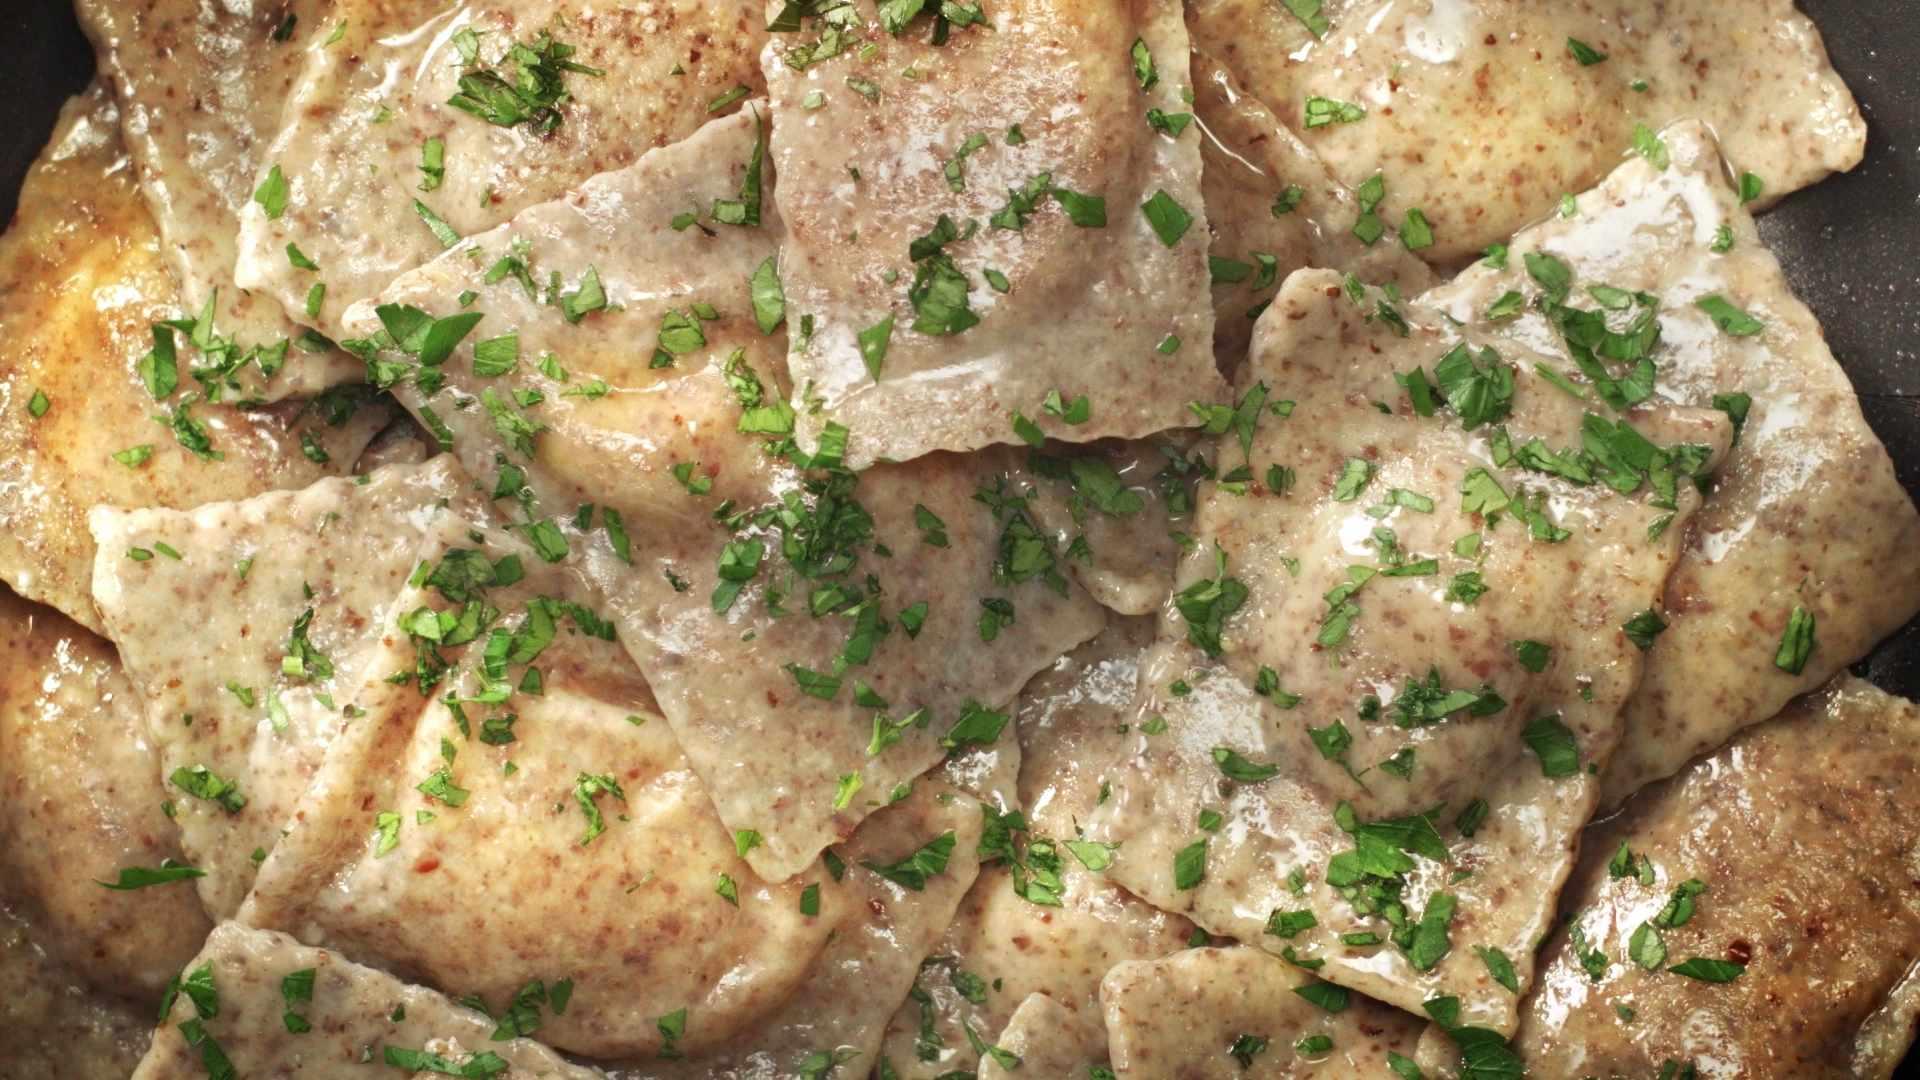 making-mayo-recipes-butternut-squash-raviolis1-16-x-9